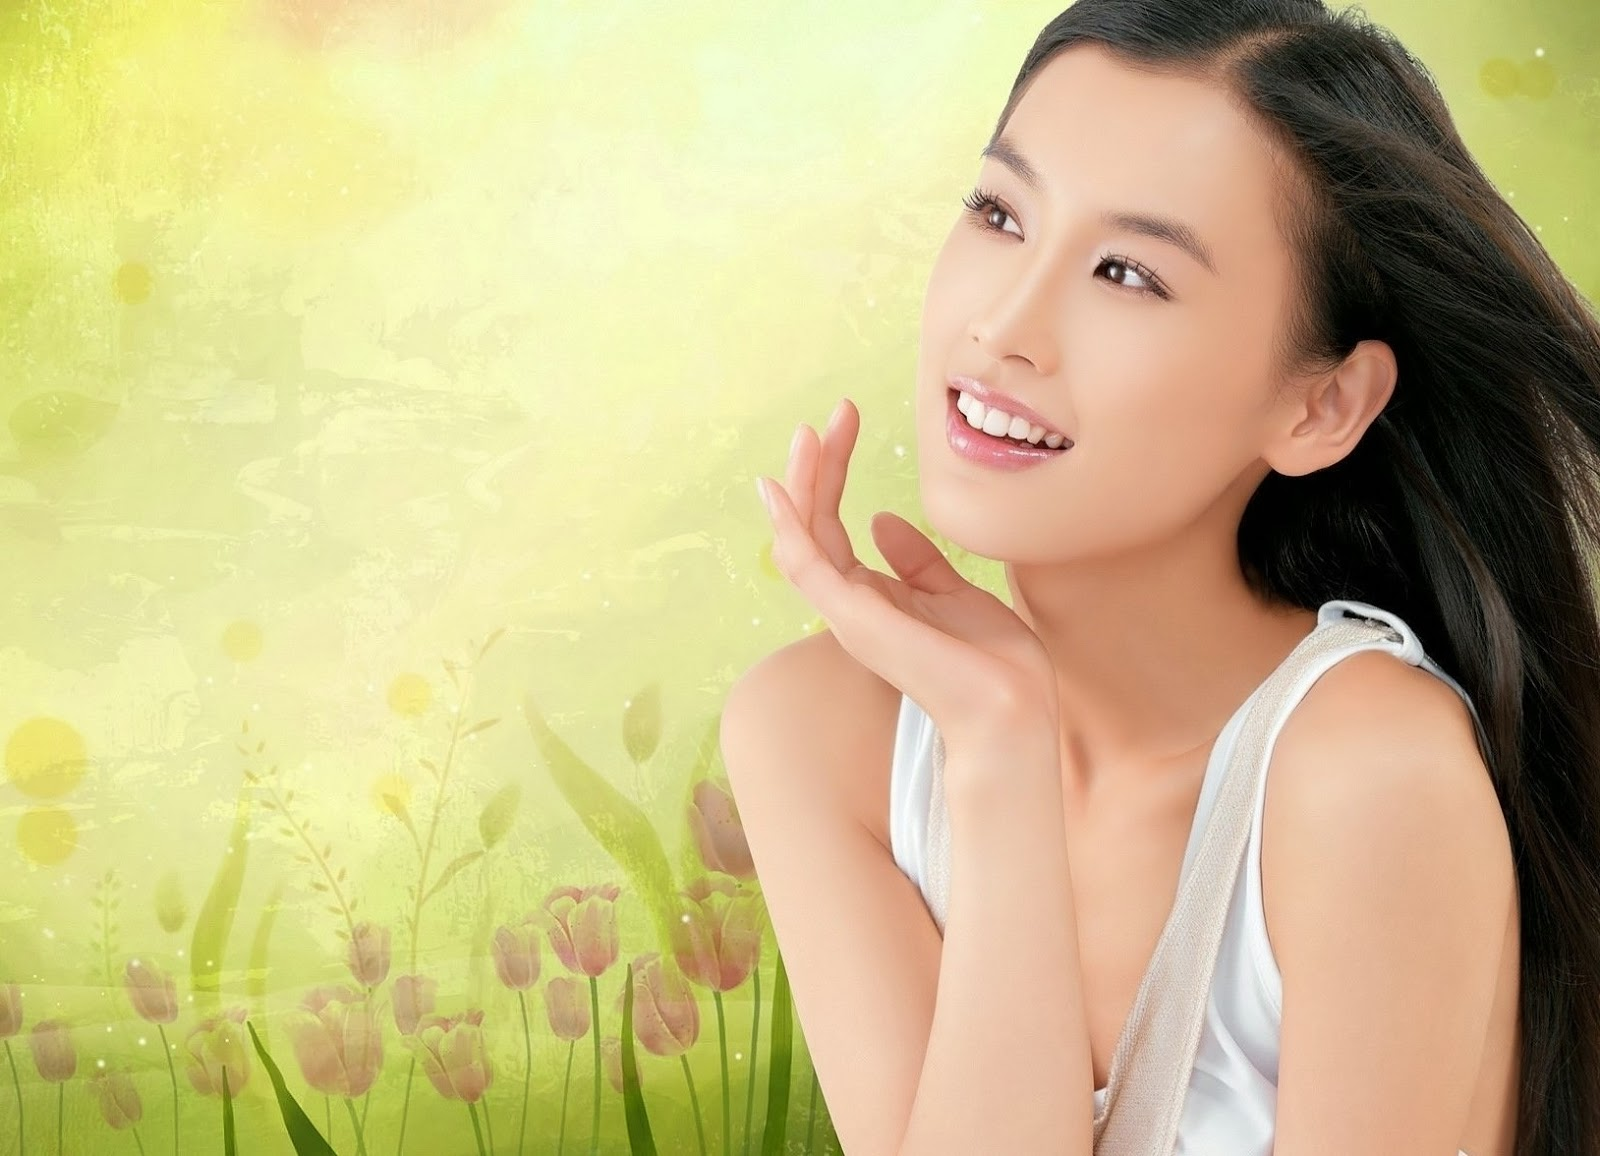 Eva Huang HD Wallpaper Free | Kumpulan Aplikasi Android